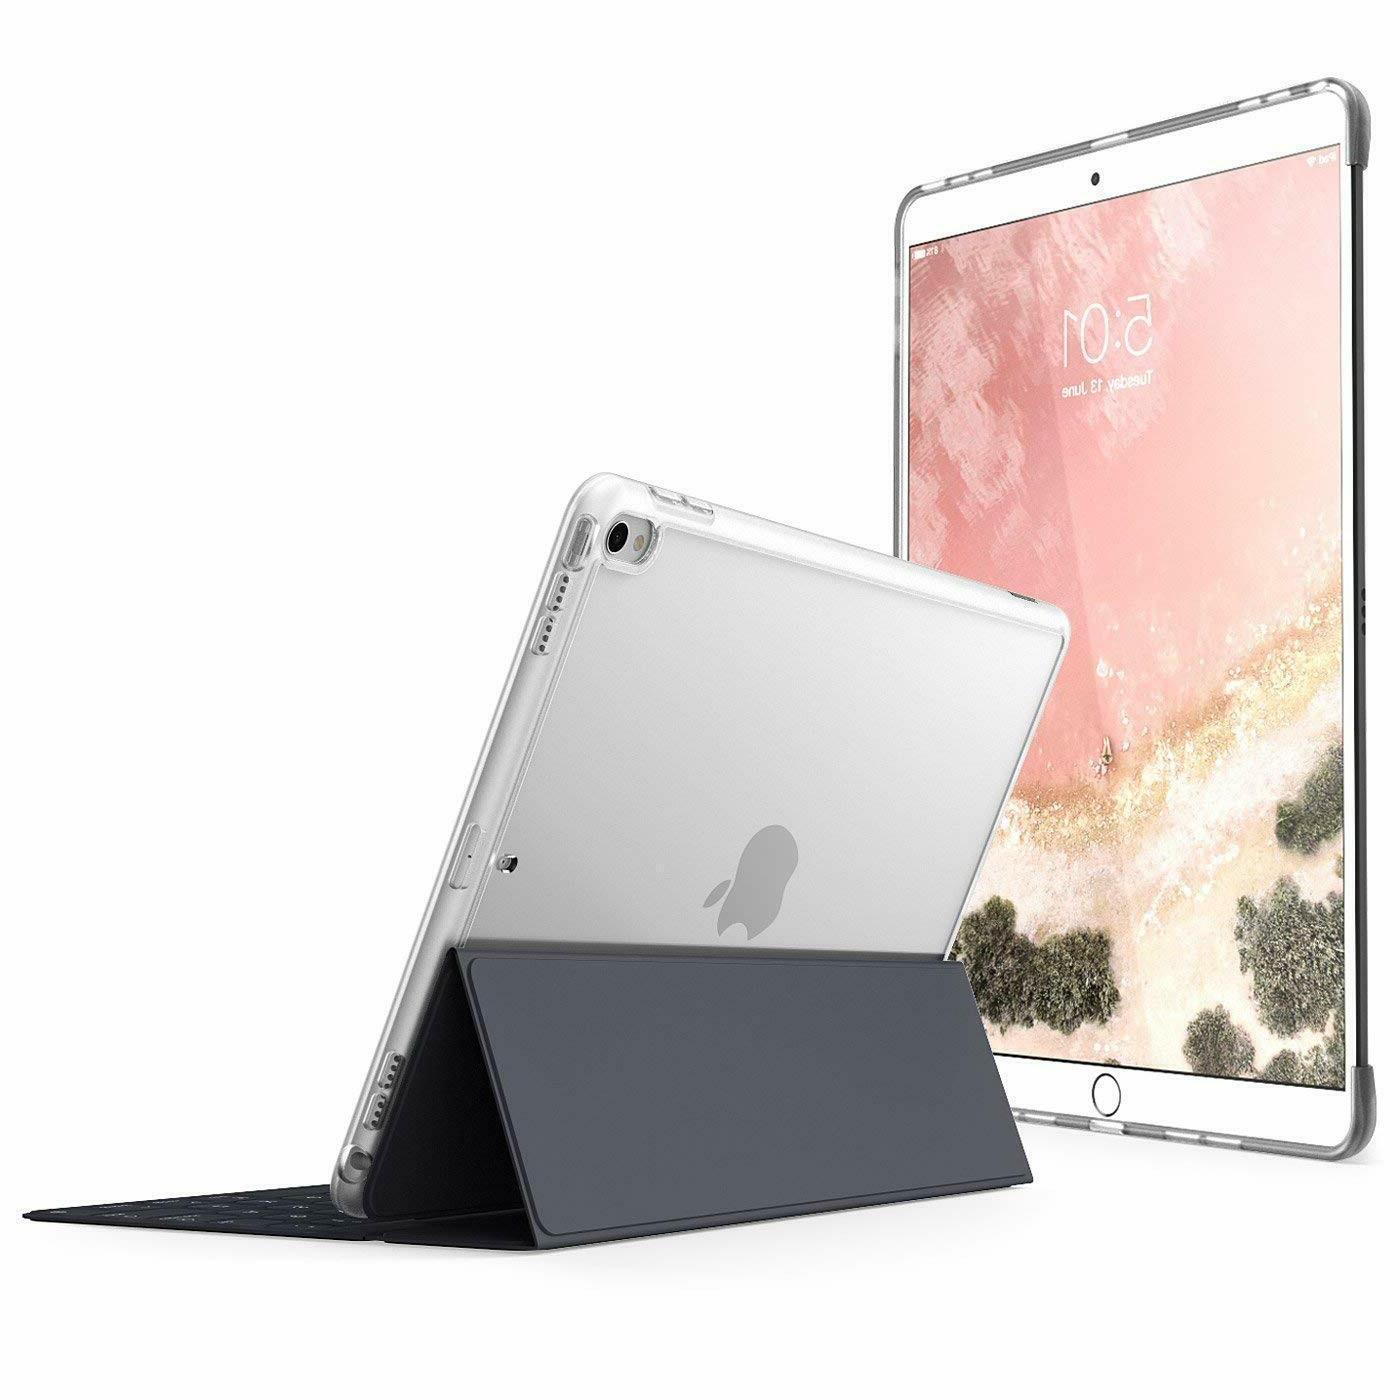 i-Blason Case for iPad Pro 12.9 11.0 2017/2018 Cover